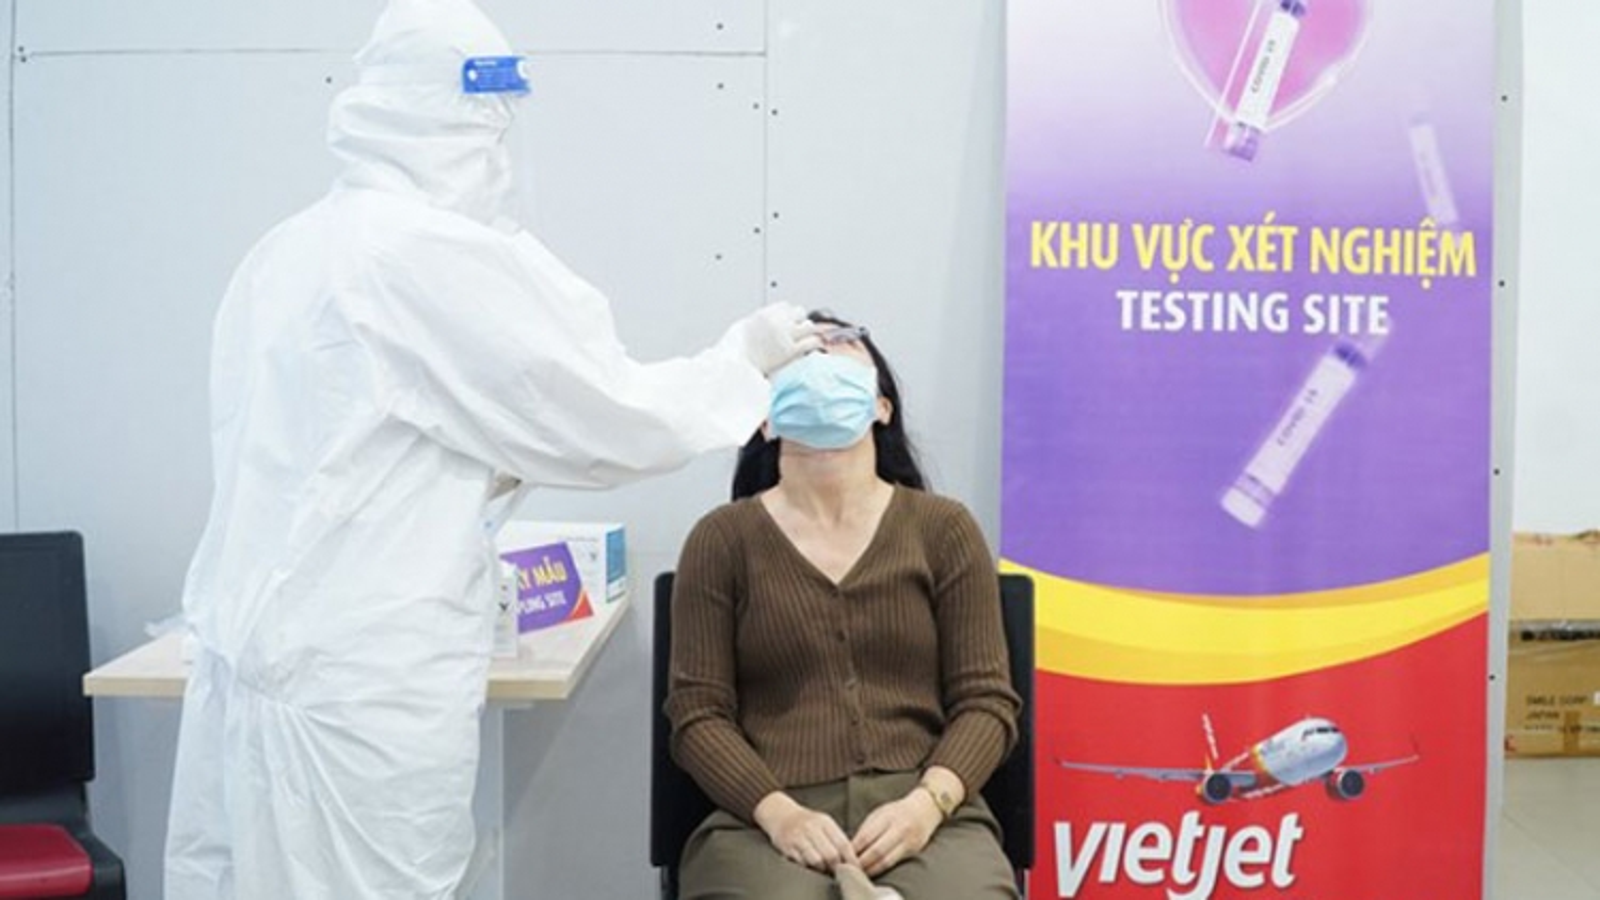 Vietjet increases domestic services with free COVID-19 tests, zero fare promotion